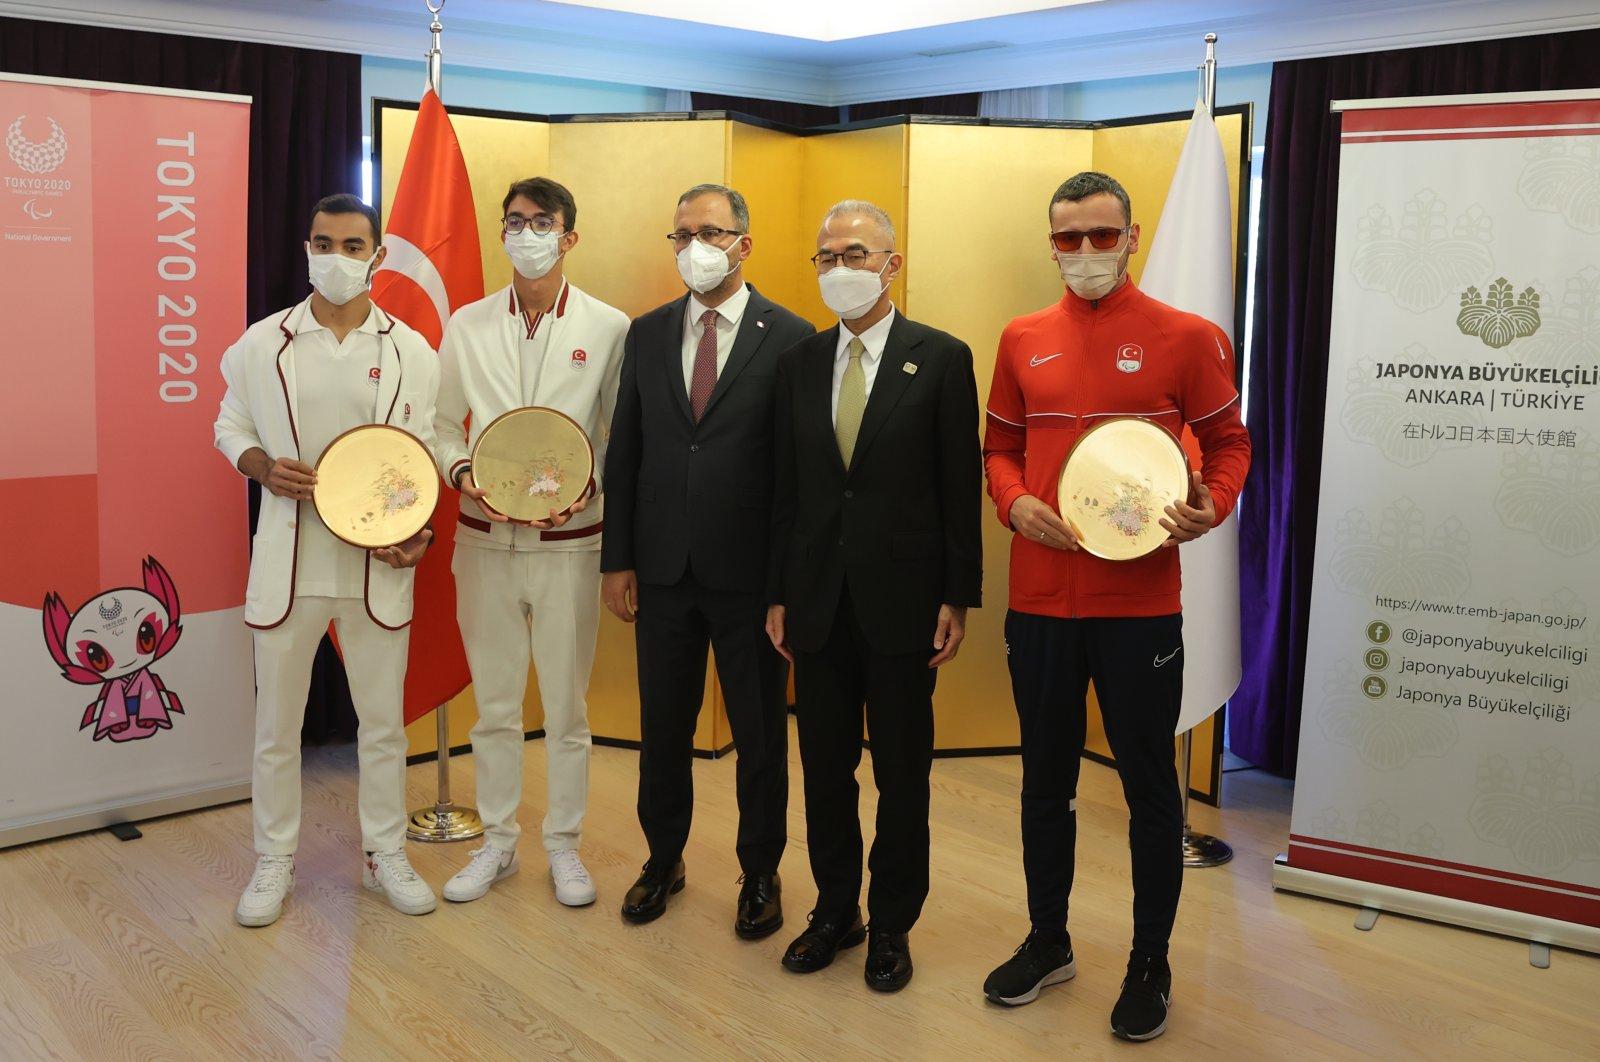 Youth and Sports Minister Mehmet Muharrem Kasapoğlu (C), Japanese Ambassador Suzuki Kazuhiro, and Olympic athletes Mete Gazoz, Ferhat Arıcan and Oğzu Akbulut are seen at the Japanese Embassy in Ankara, Turkey, Oct. 4, 2021 (AA Photo)